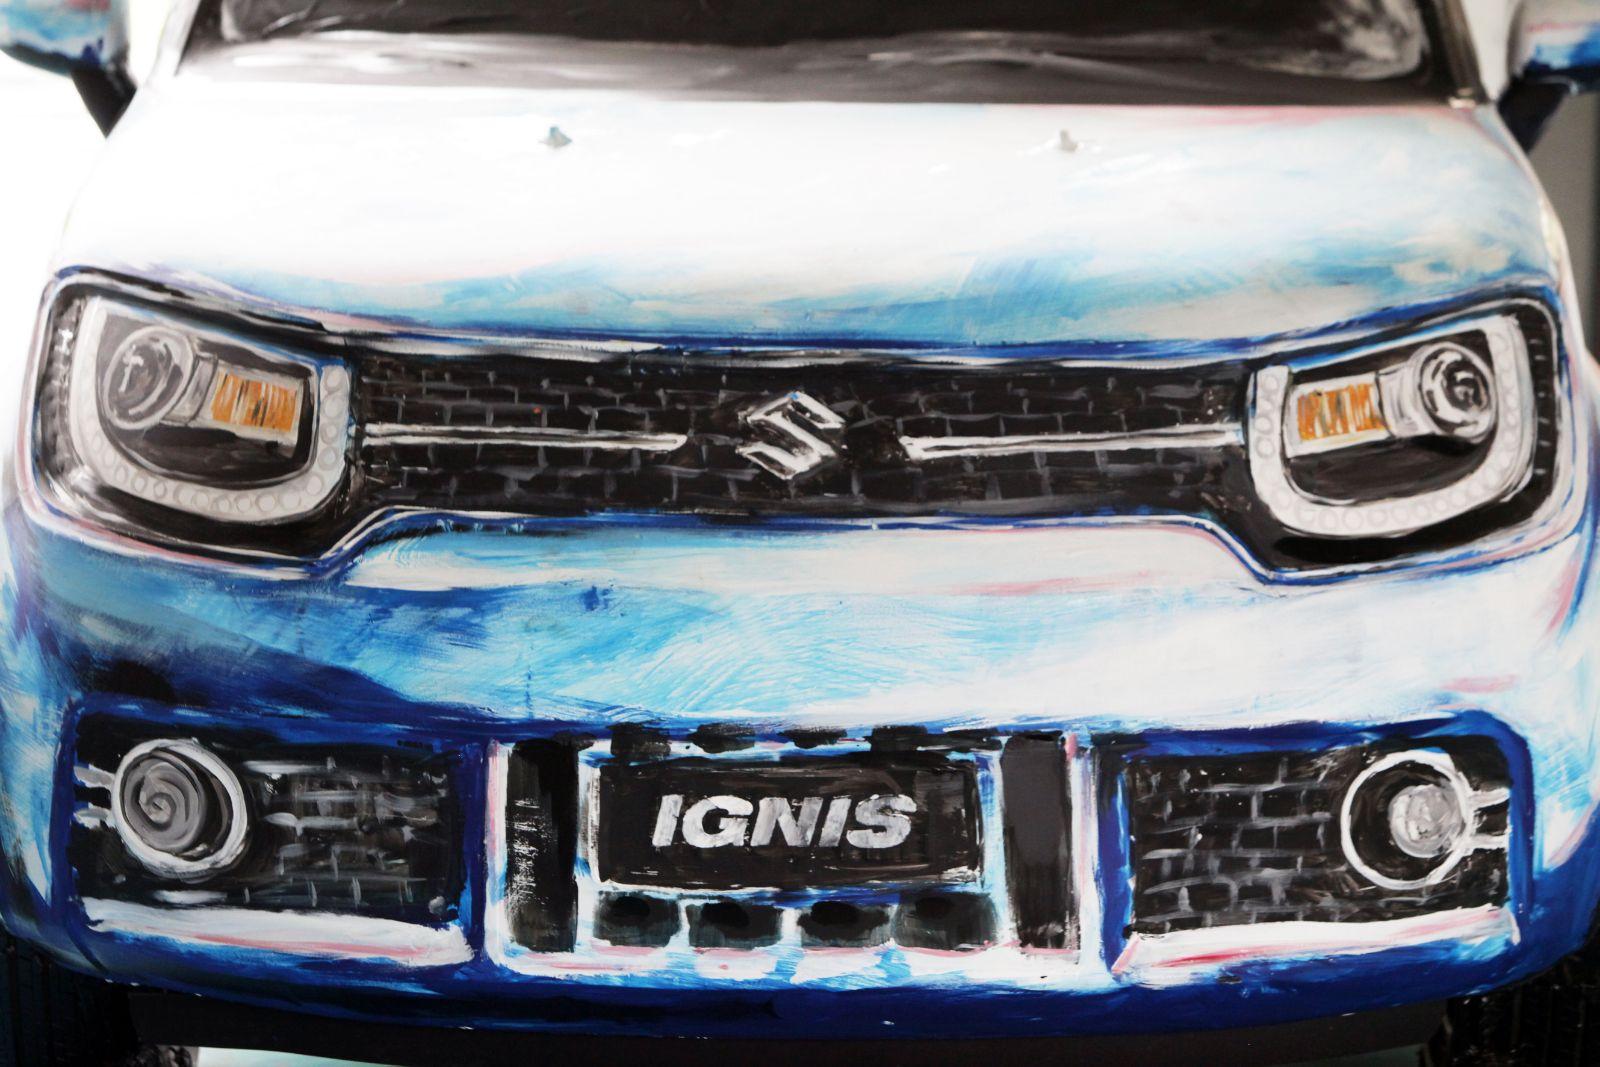 95-c-s-asta-ignis-hybrid-art-6